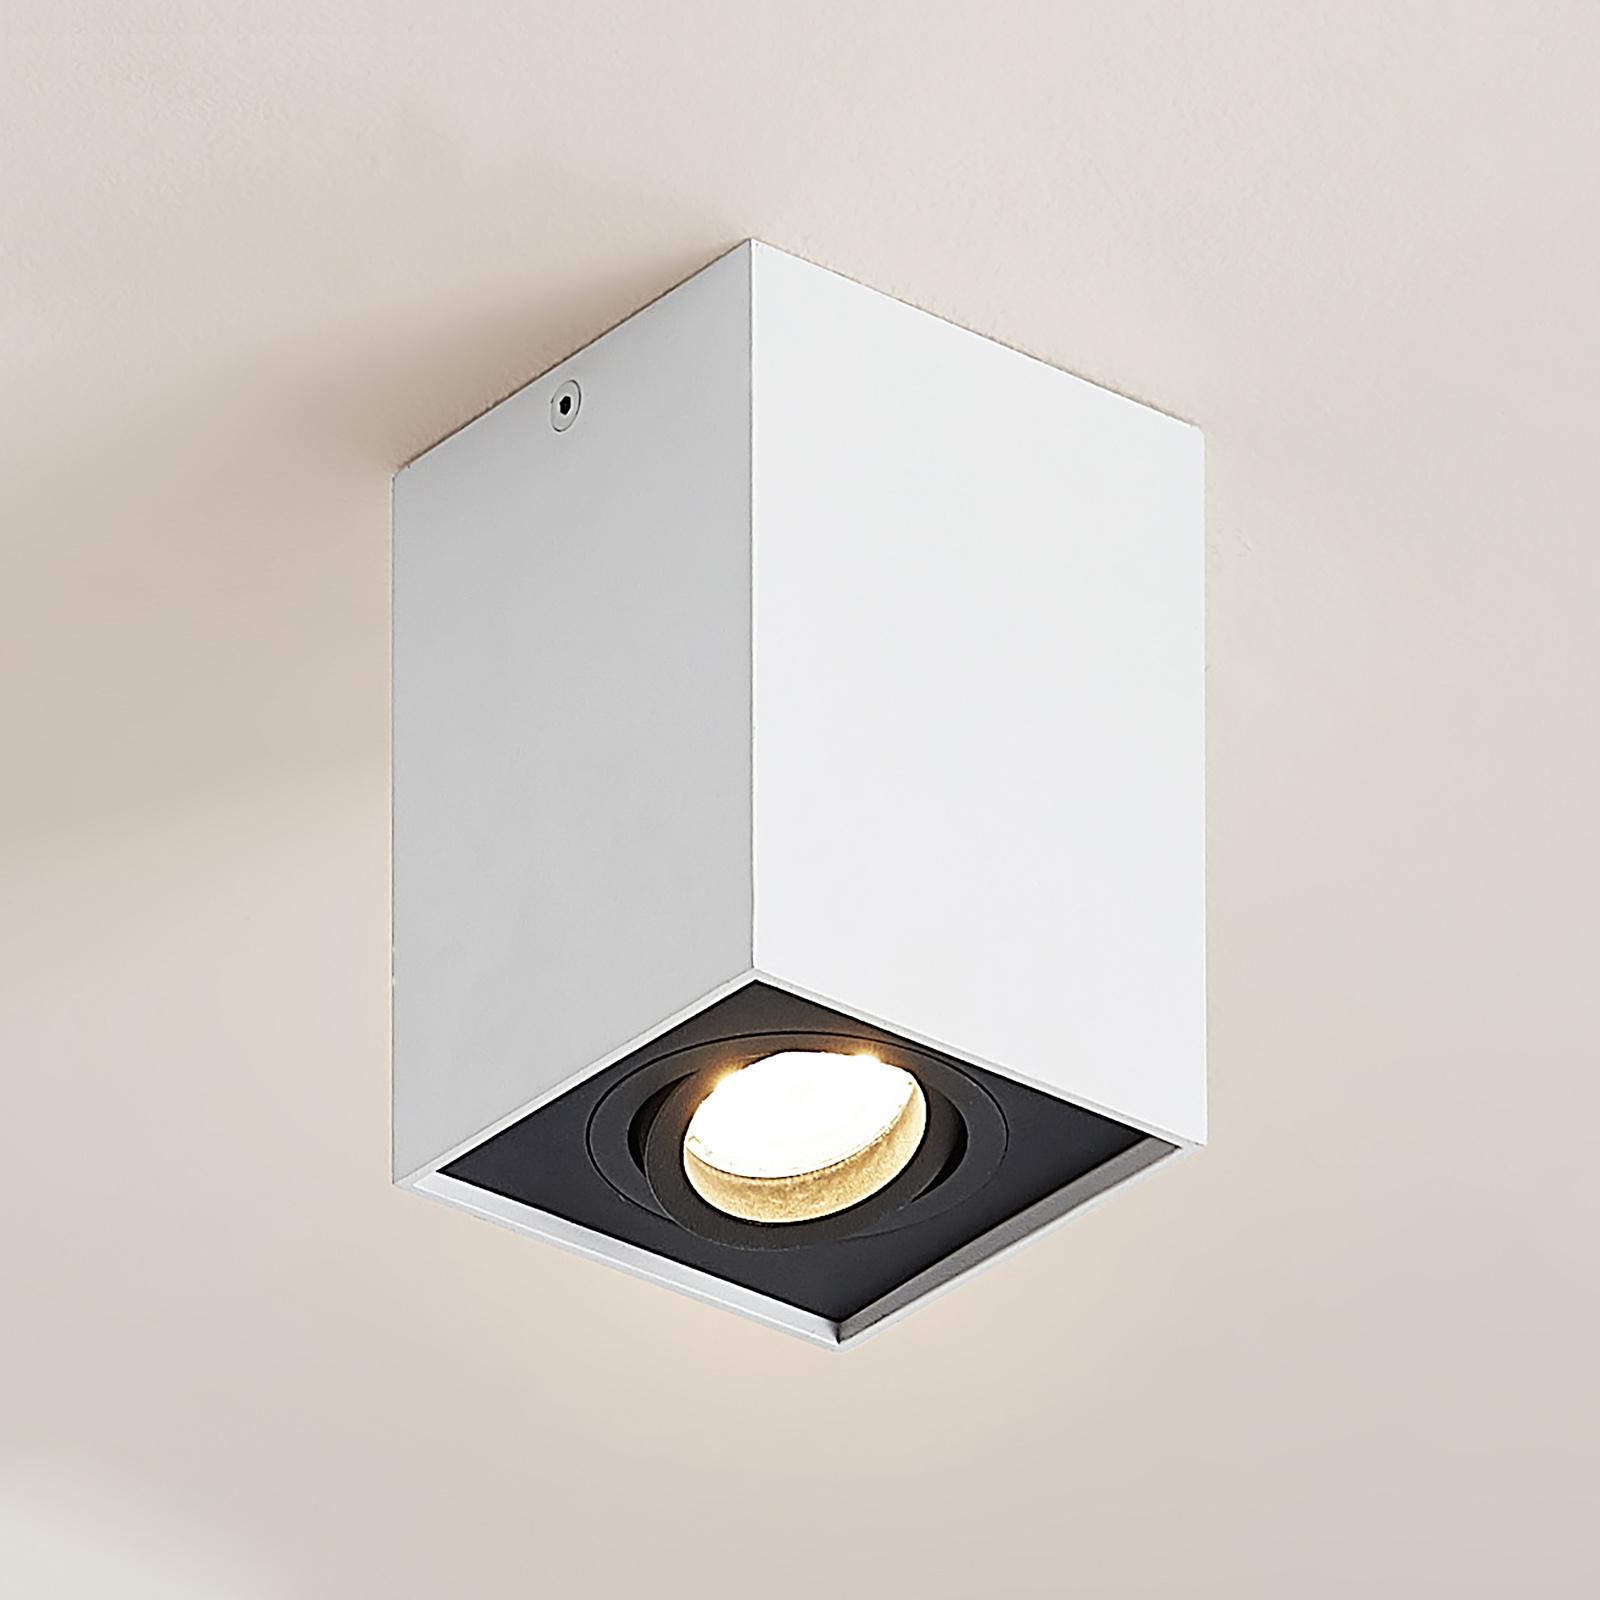 Arcchio Hermalina taklampe, kantet, 1 lyskilde